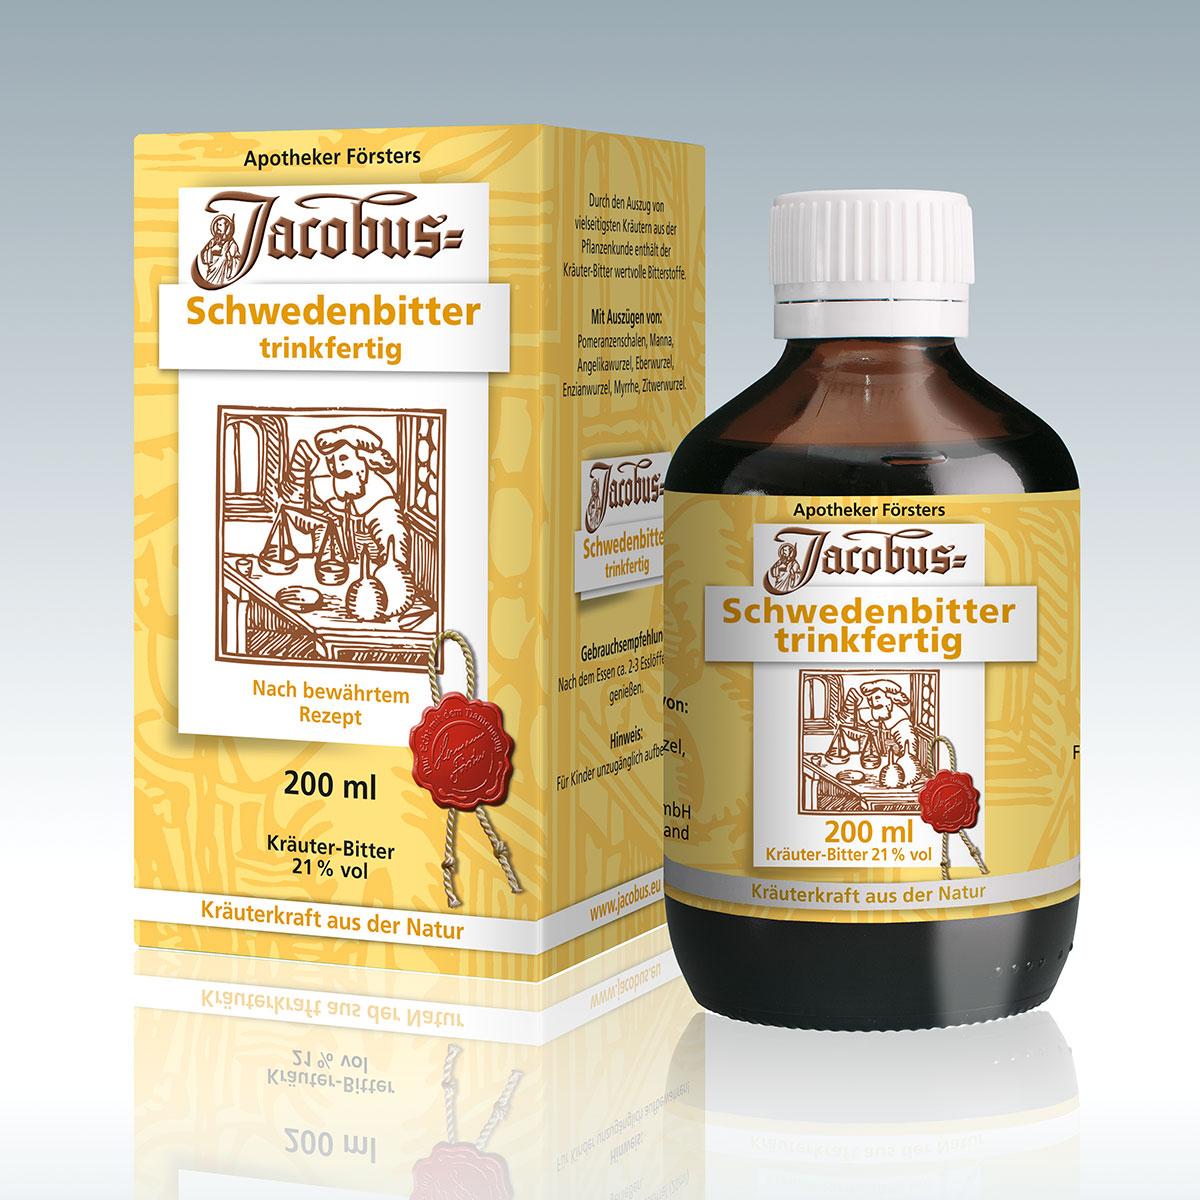 Jacobus-Schwedenbitter trinkfertig 200ml